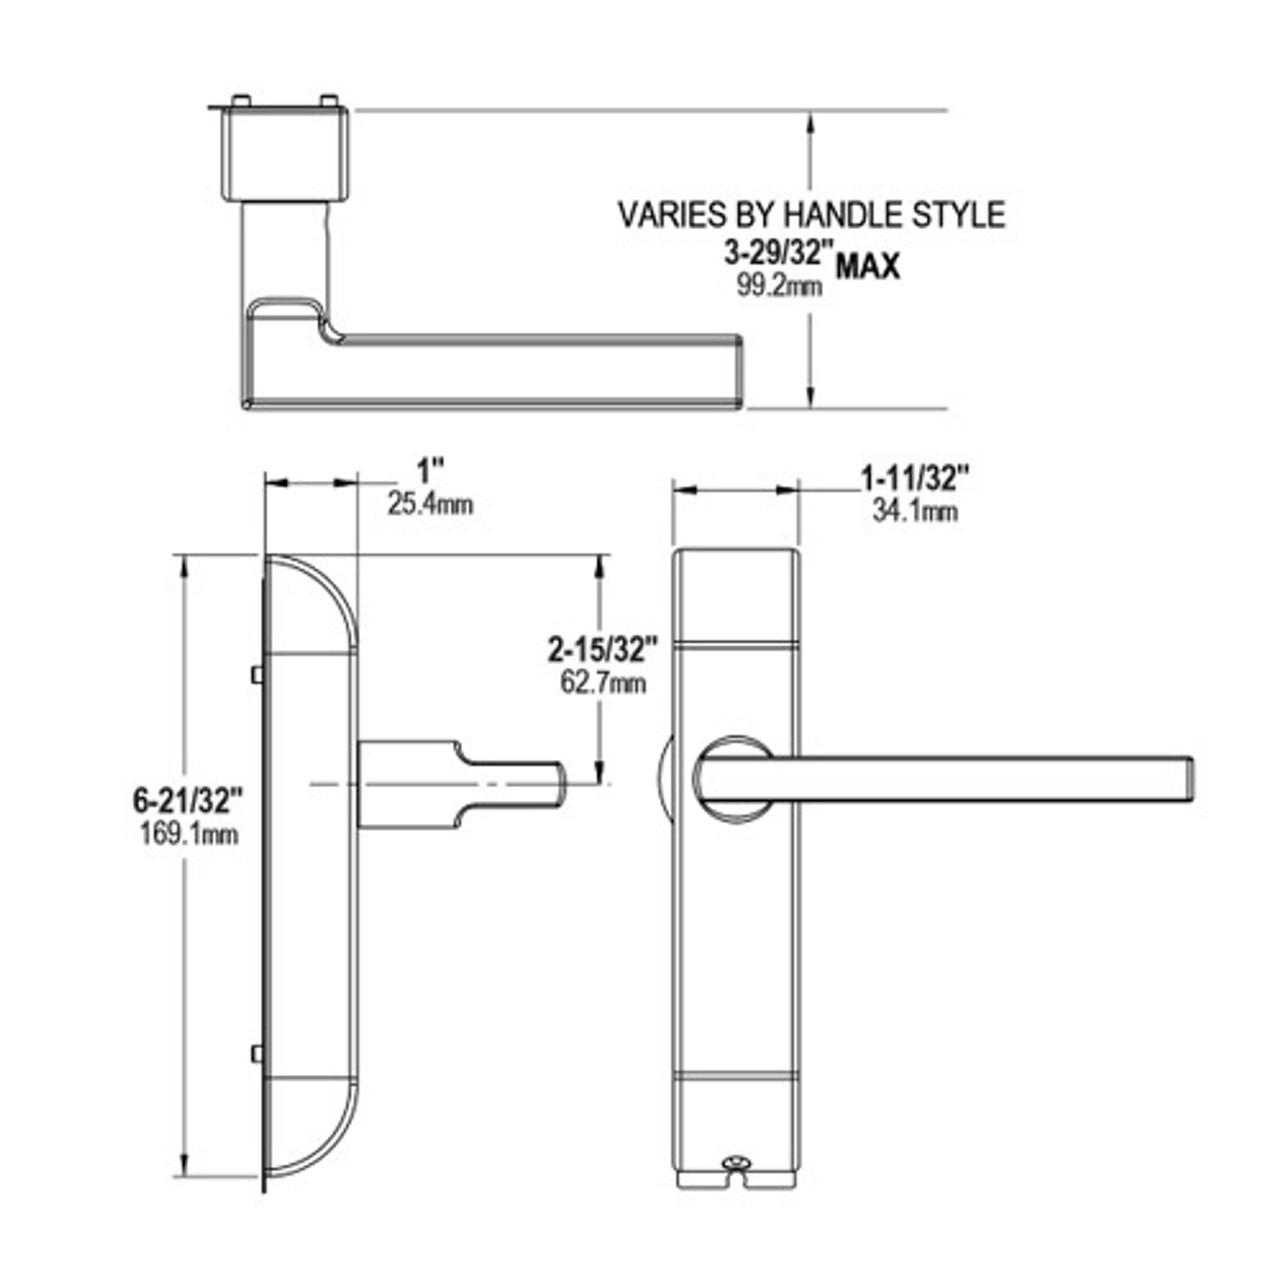 4600-MV-552-US10B Adams Rite MV Designer handle Dimensional View